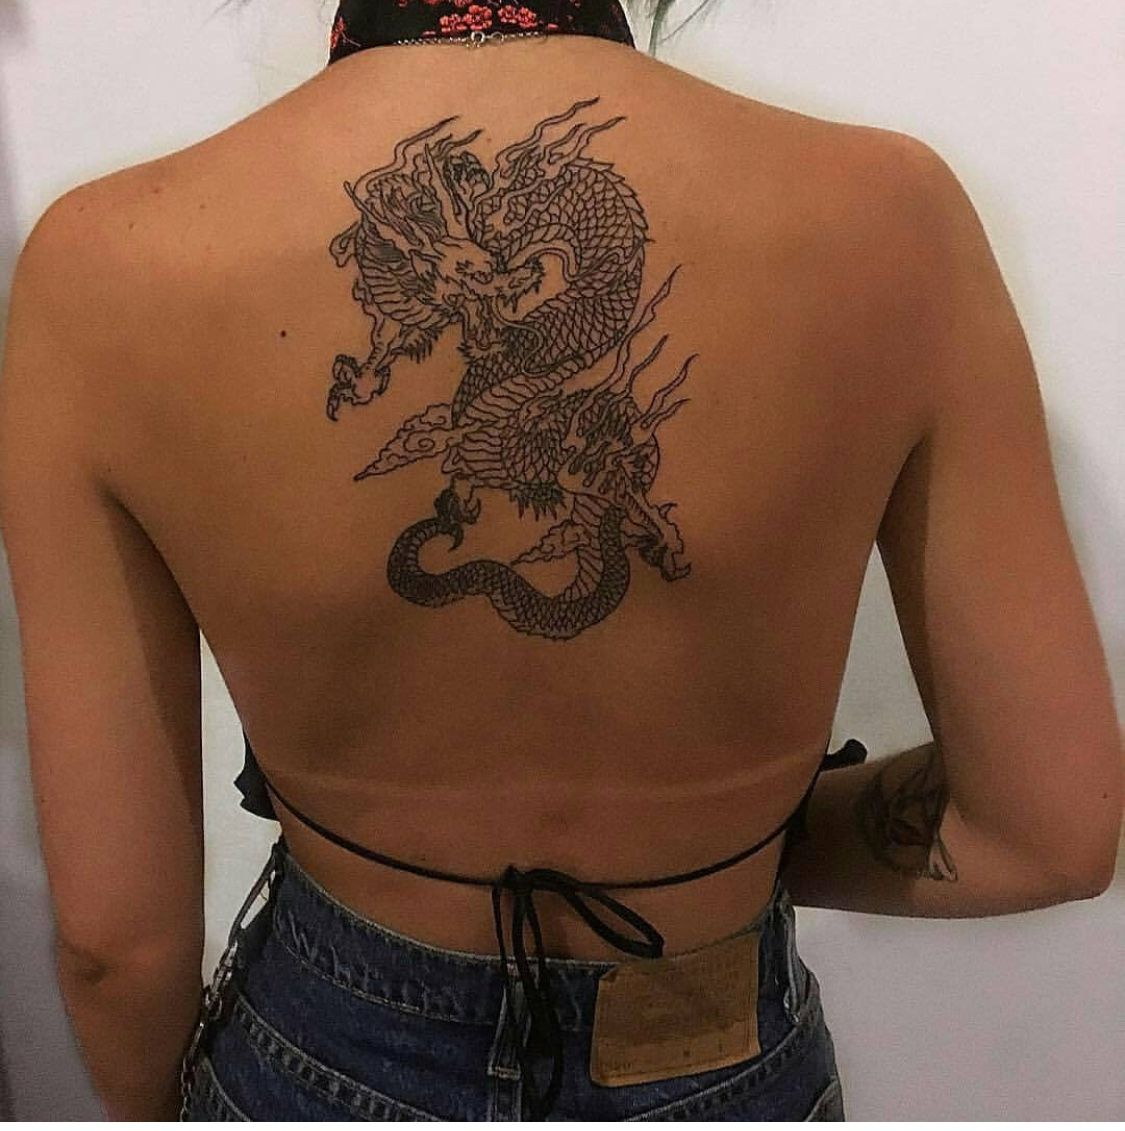 Cute tattoo ideas for lower back pinterest danicaa  tattoos  pinterest  tattoo piercings